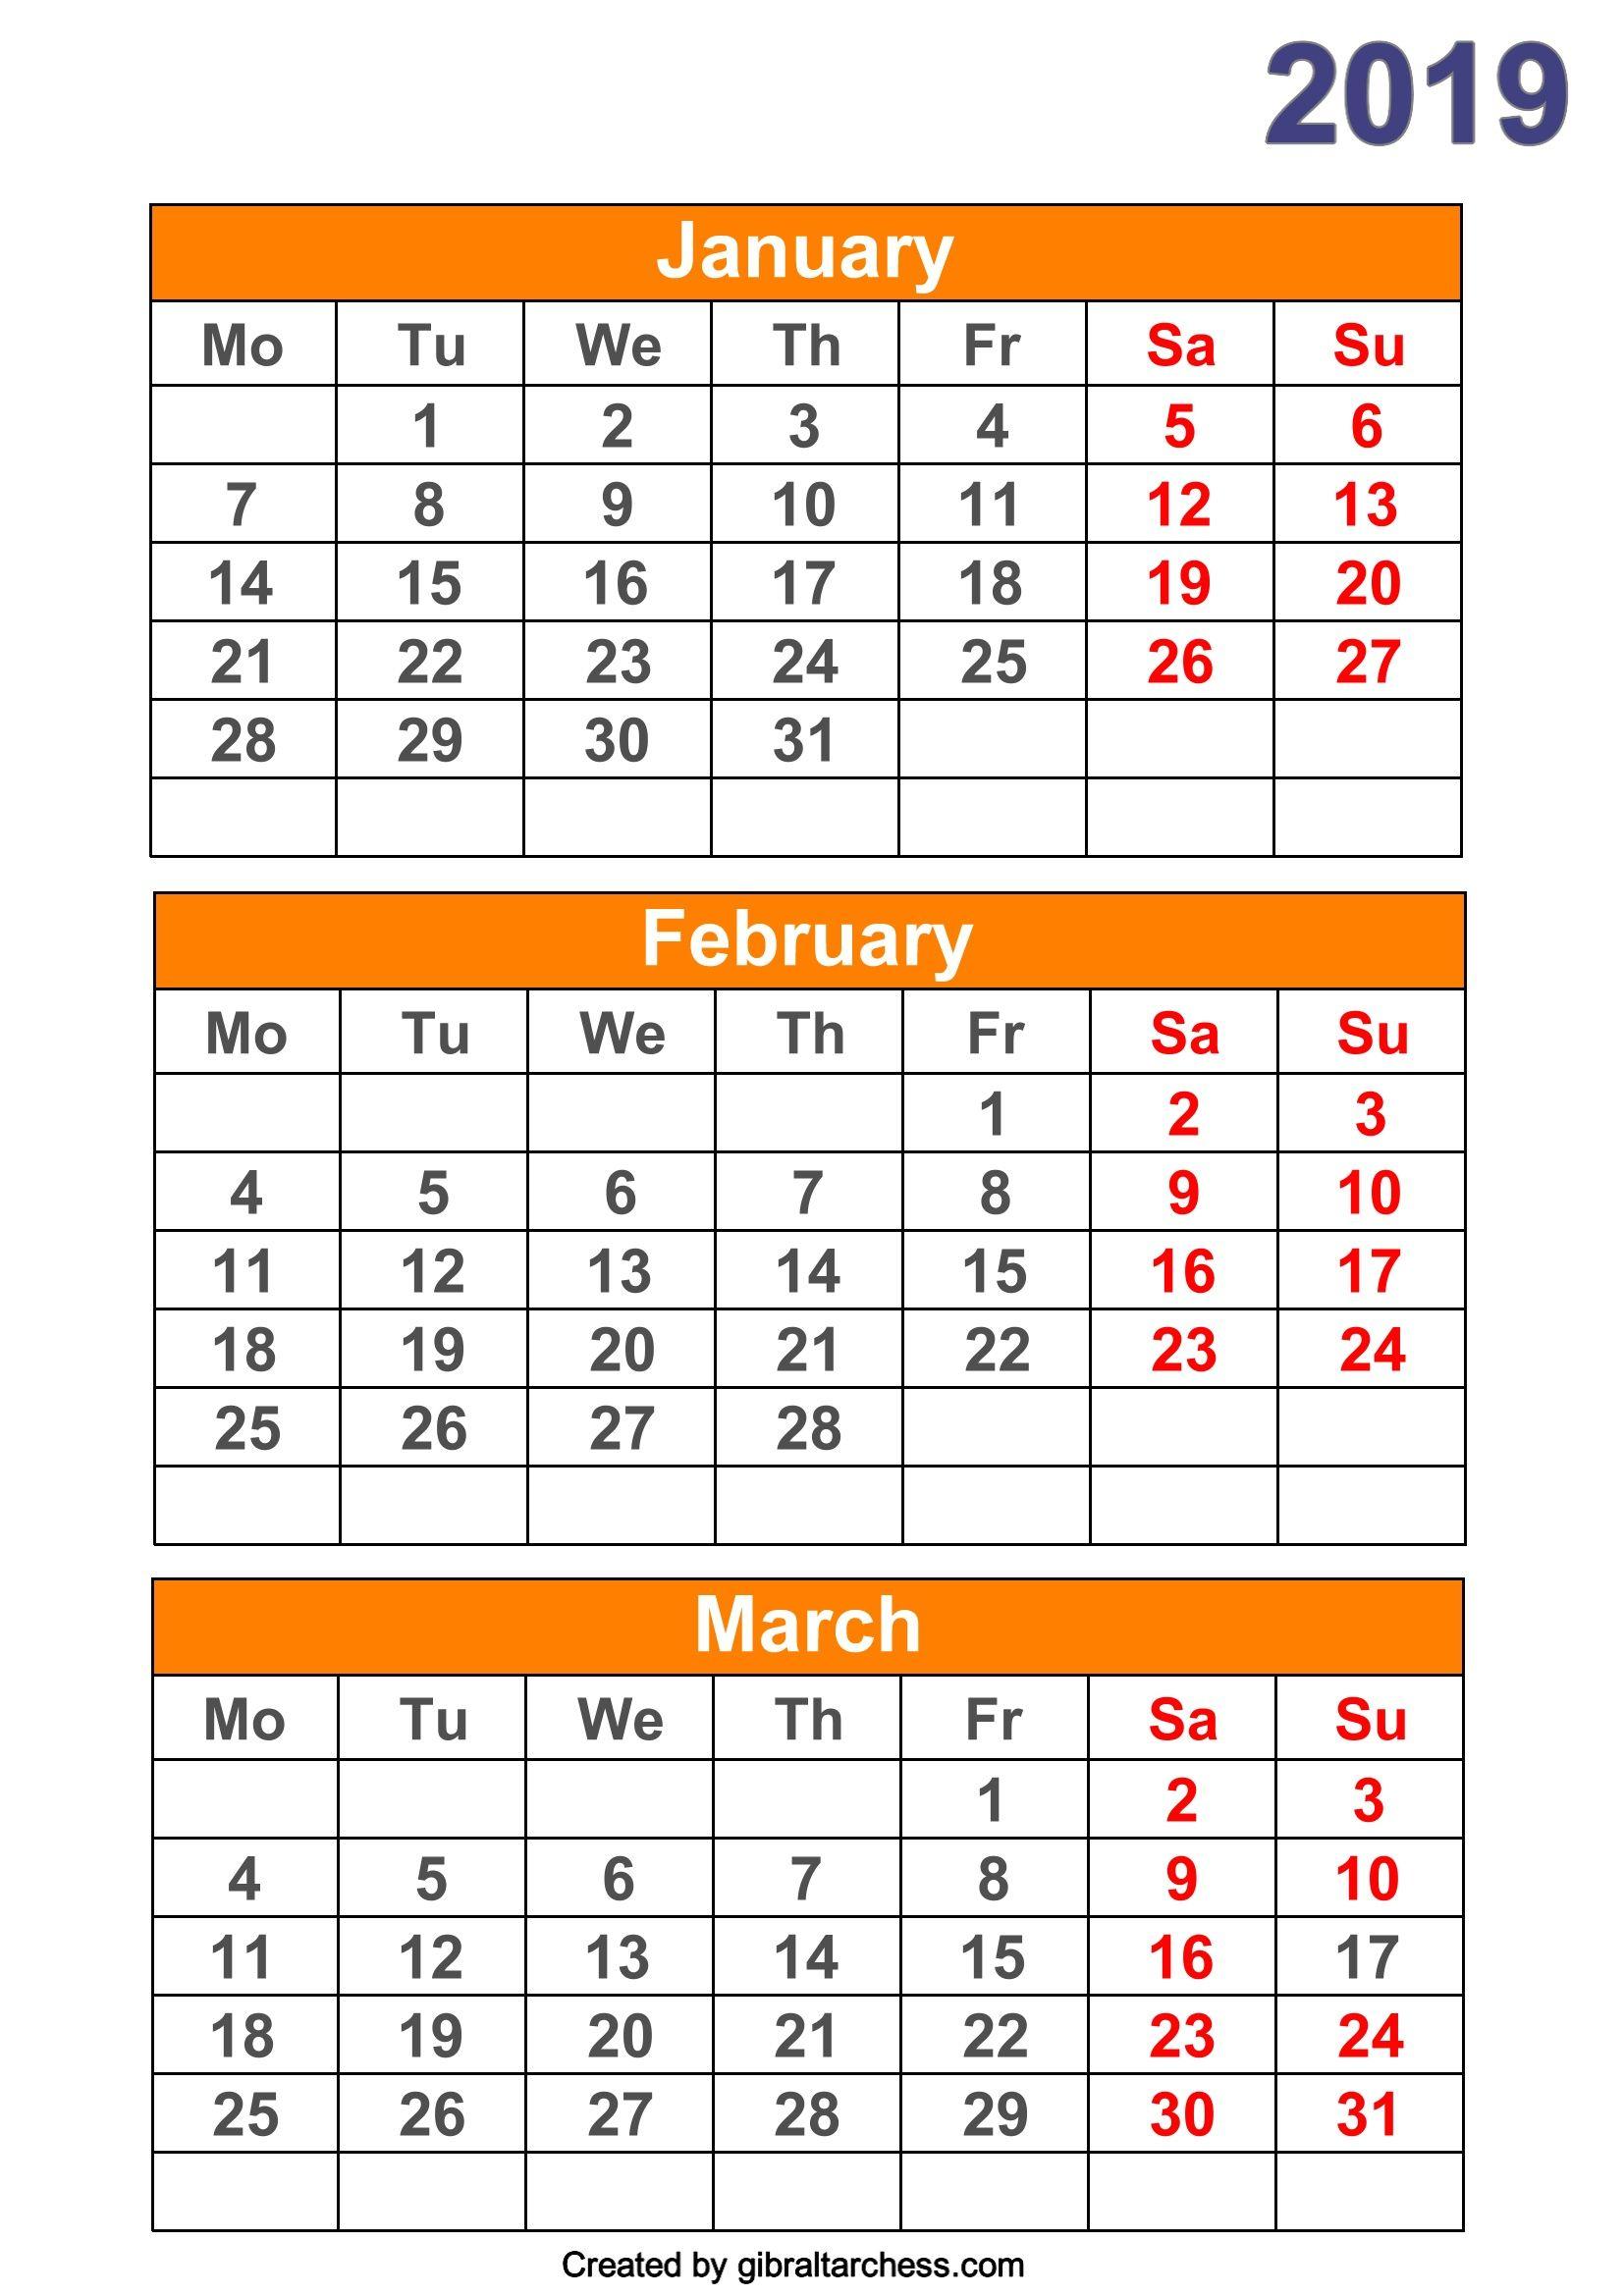 2019 Calendar 4 Months Per Page Printable | Calendar